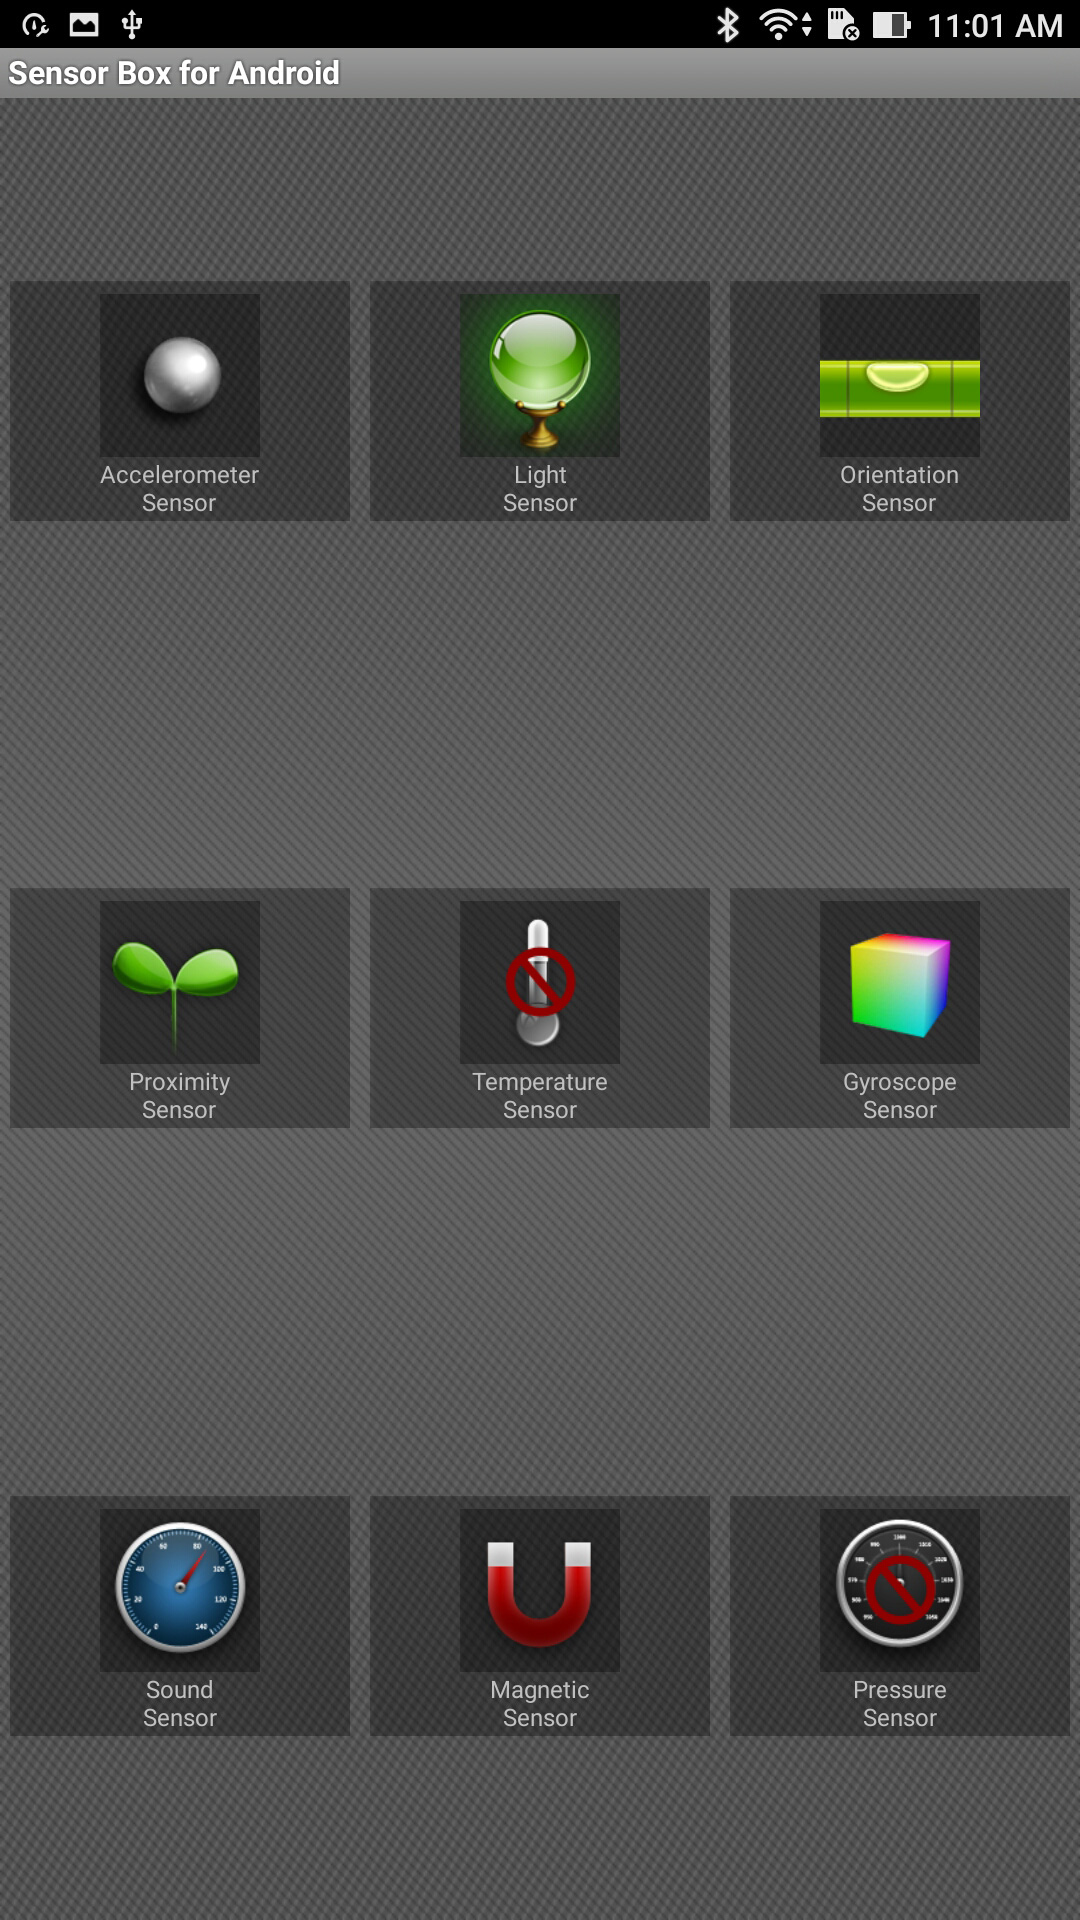 Asus ZenFone 3 Ultra ZU680KL Review: Overprice but Killer Display 1